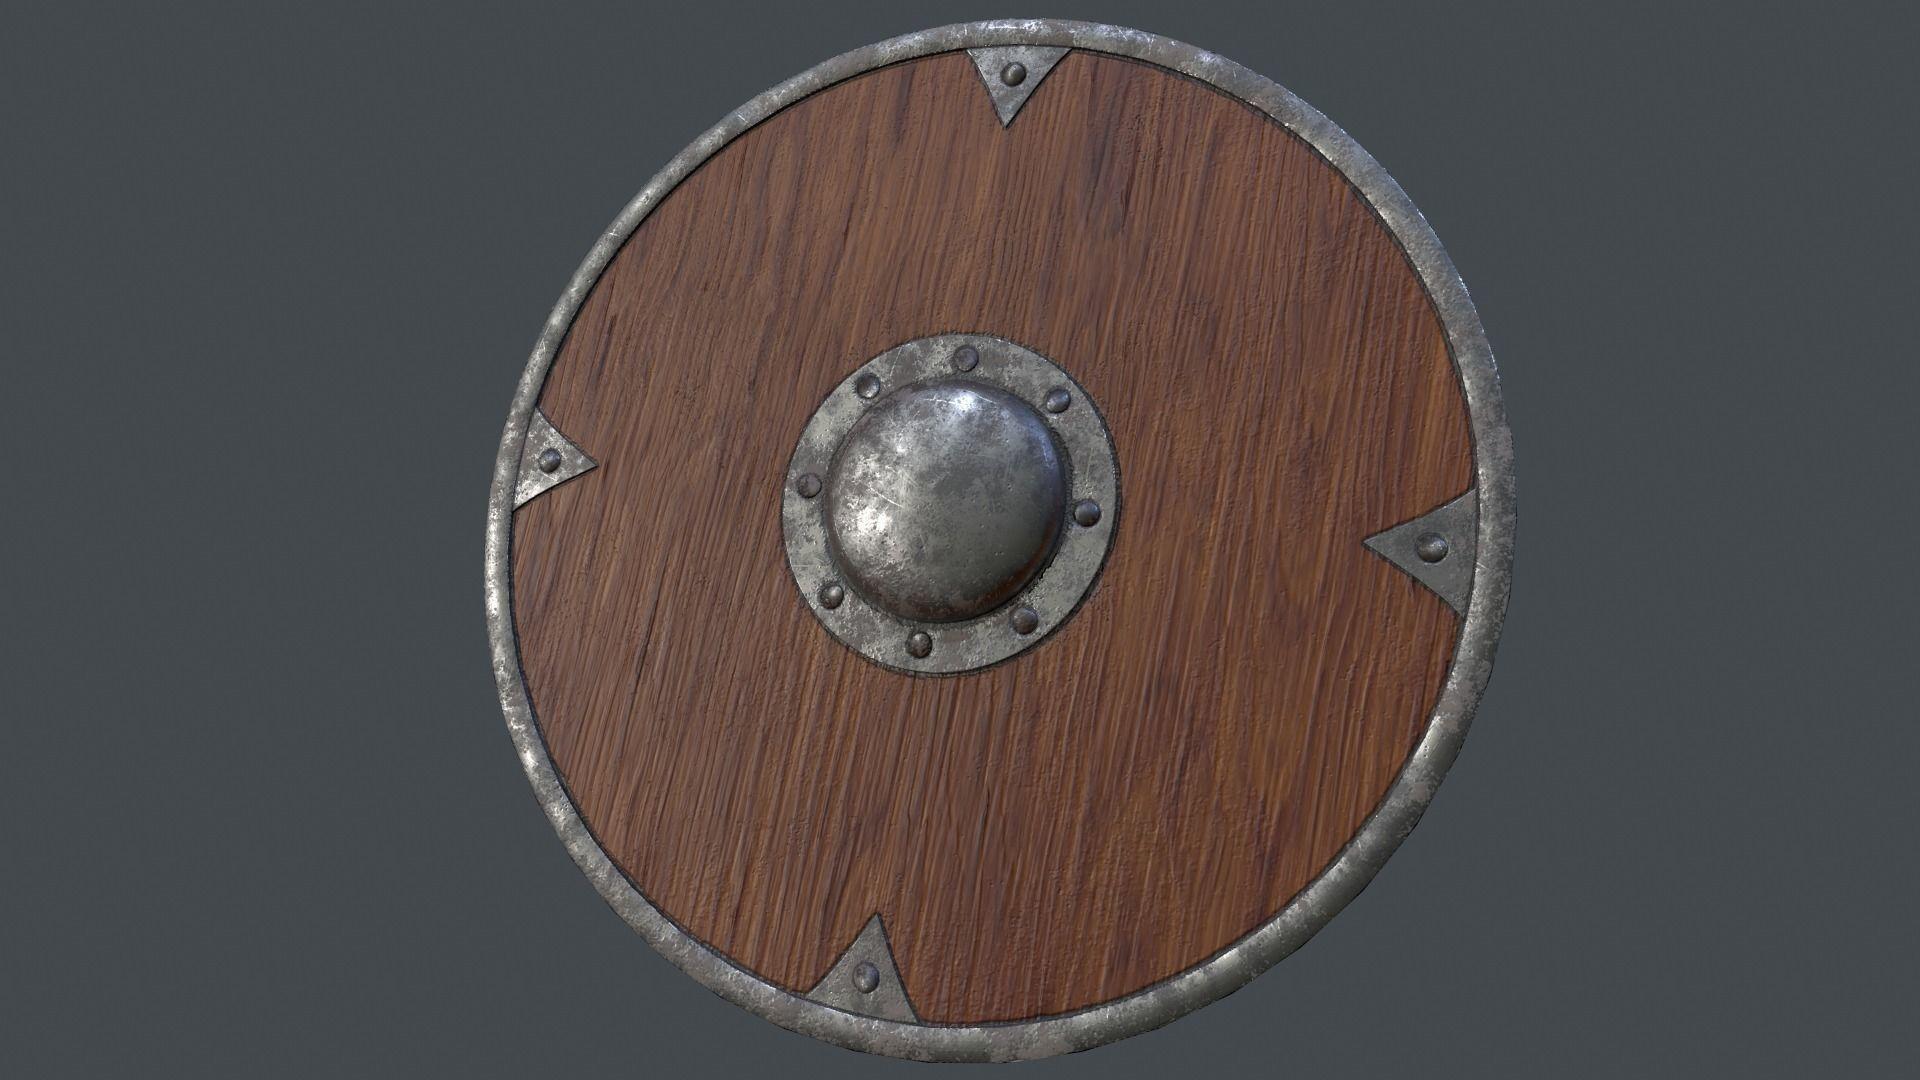 Spiked Brown Viking Shield 3d Model Low Poly Obj Mtl Fbx 1